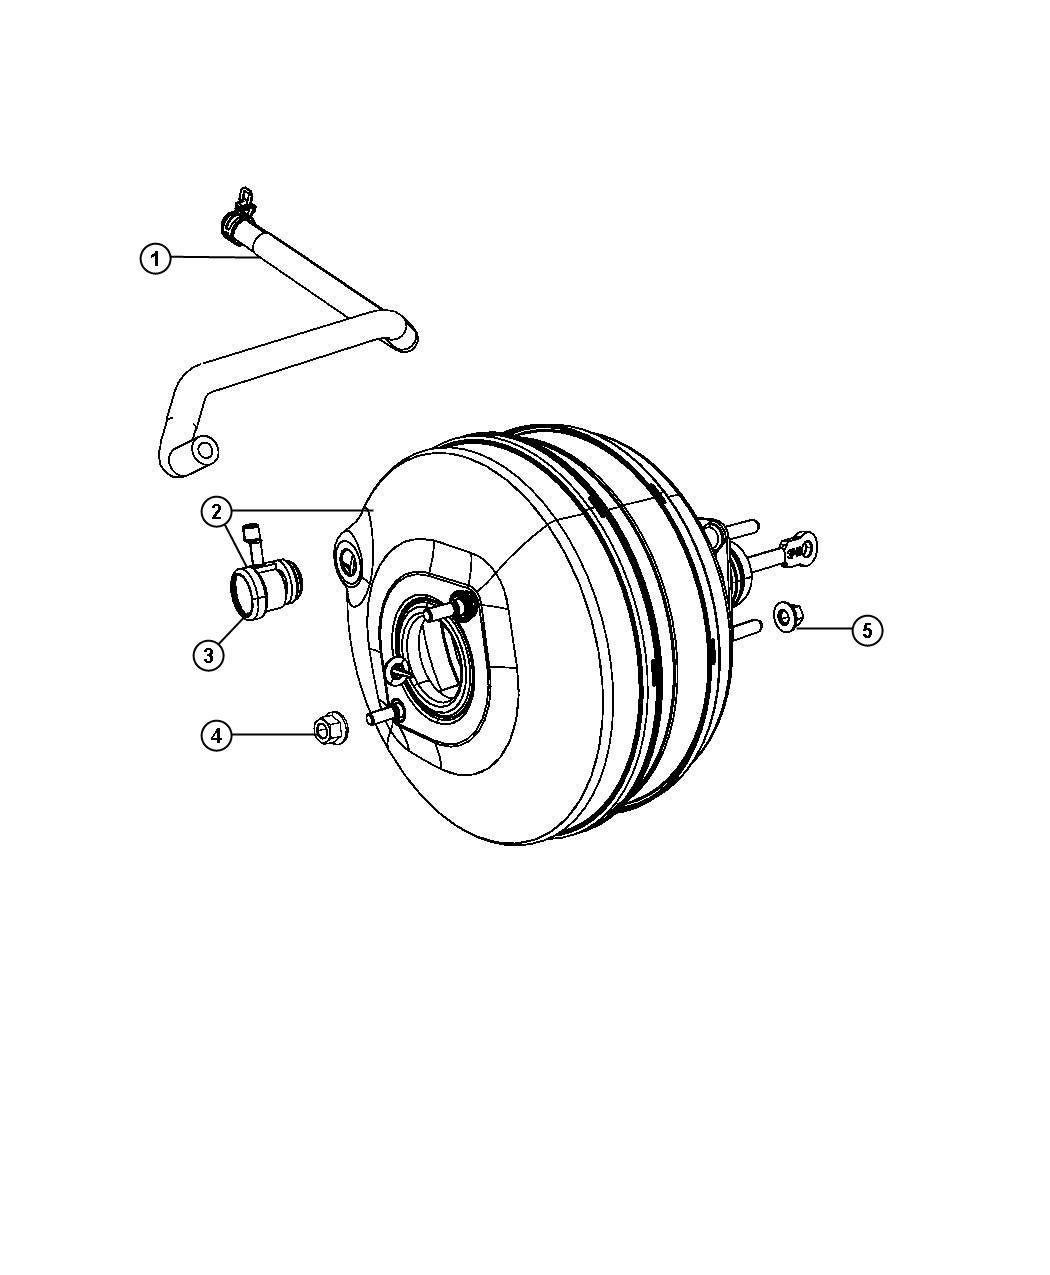 2011 Dodge Ram 1500 Hose. Brake booster vacuum. Brakes